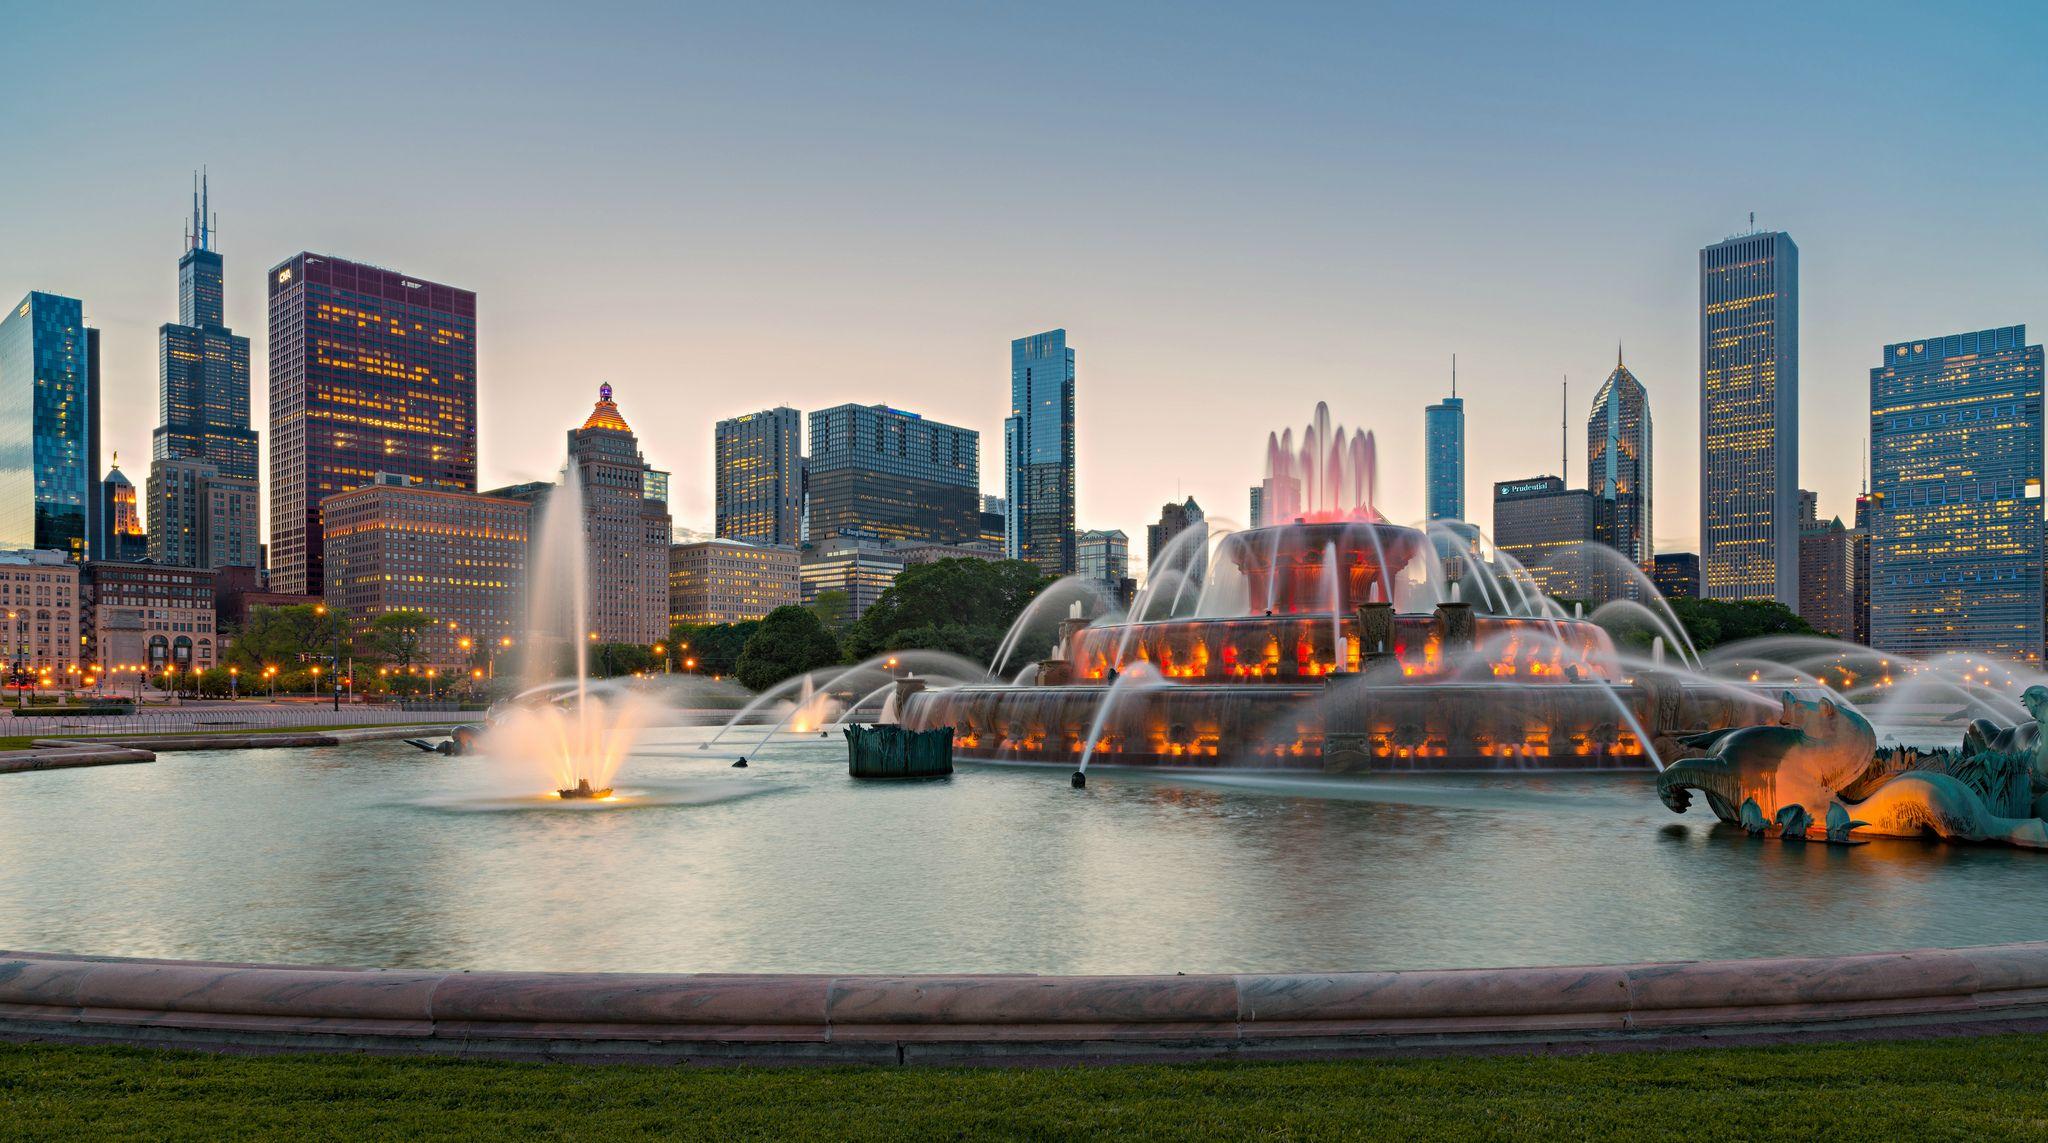 Buckingham Fountain: City, Fountain, Chicago